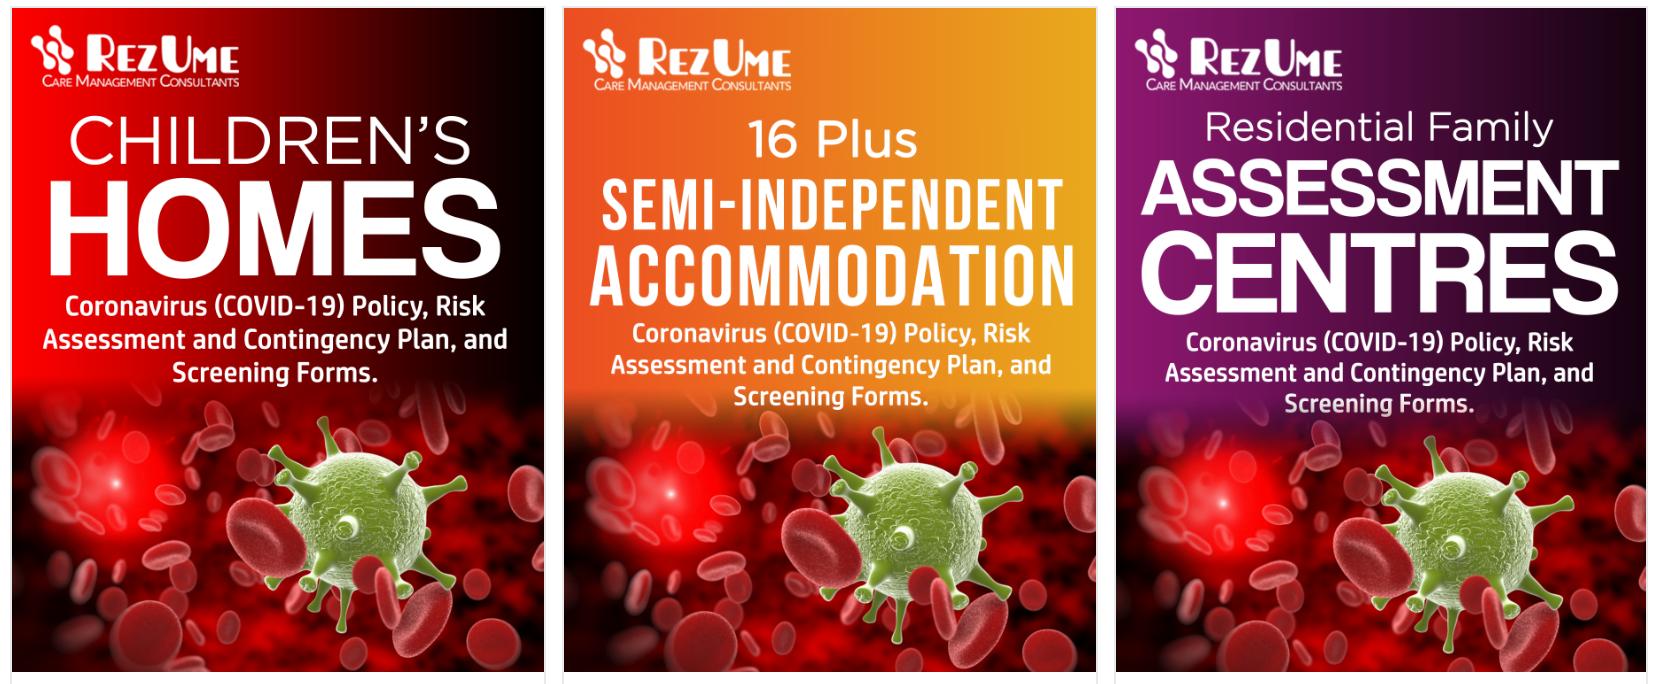 Children's Residential Children's Homes Coronavirus Policy